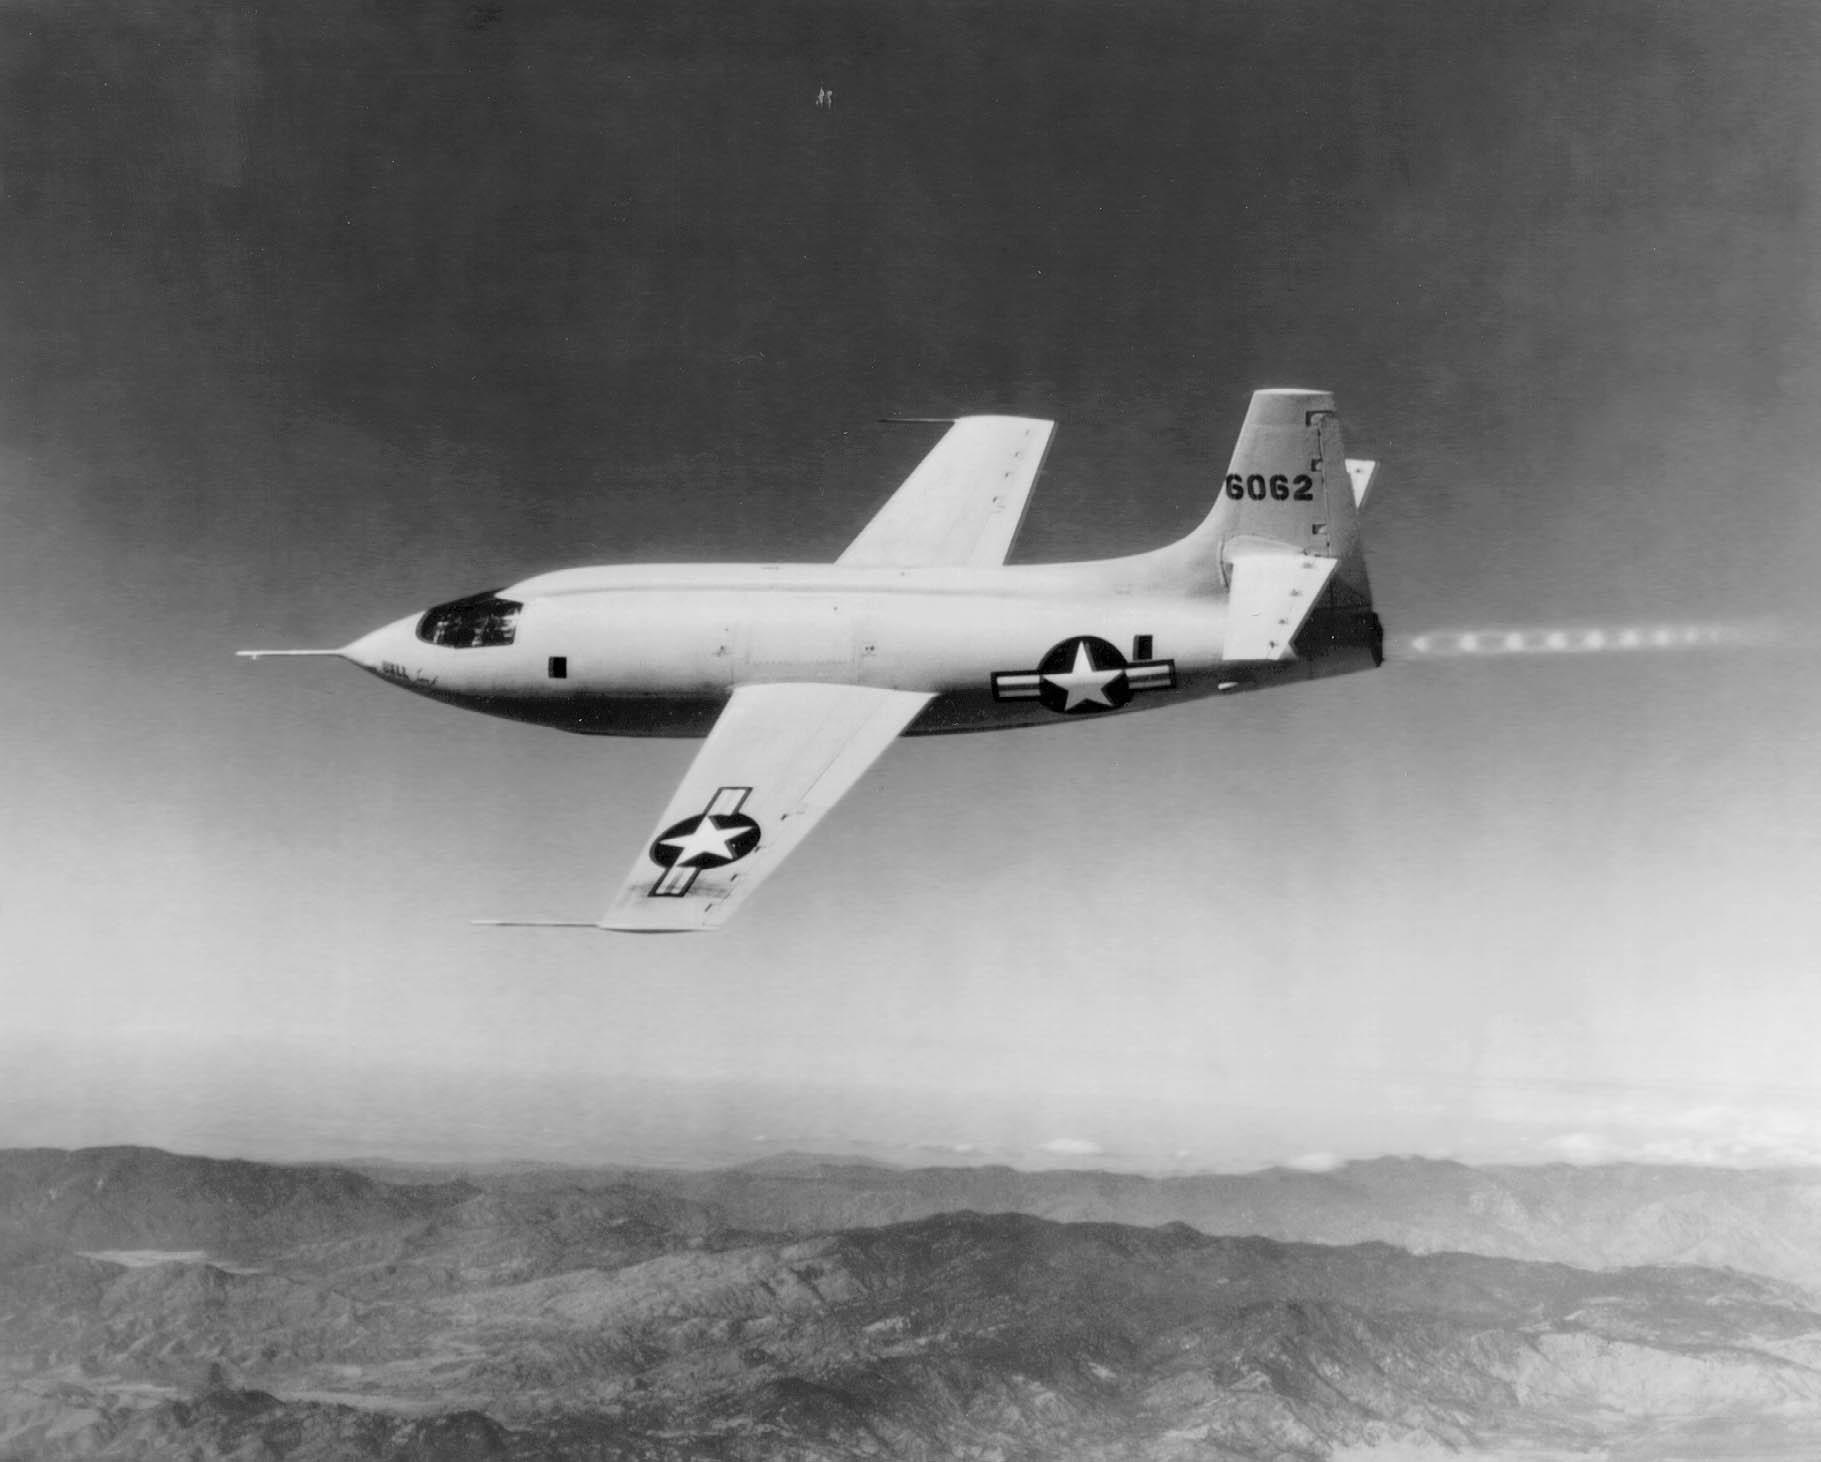 Bell_X-1_in_flight.jpg